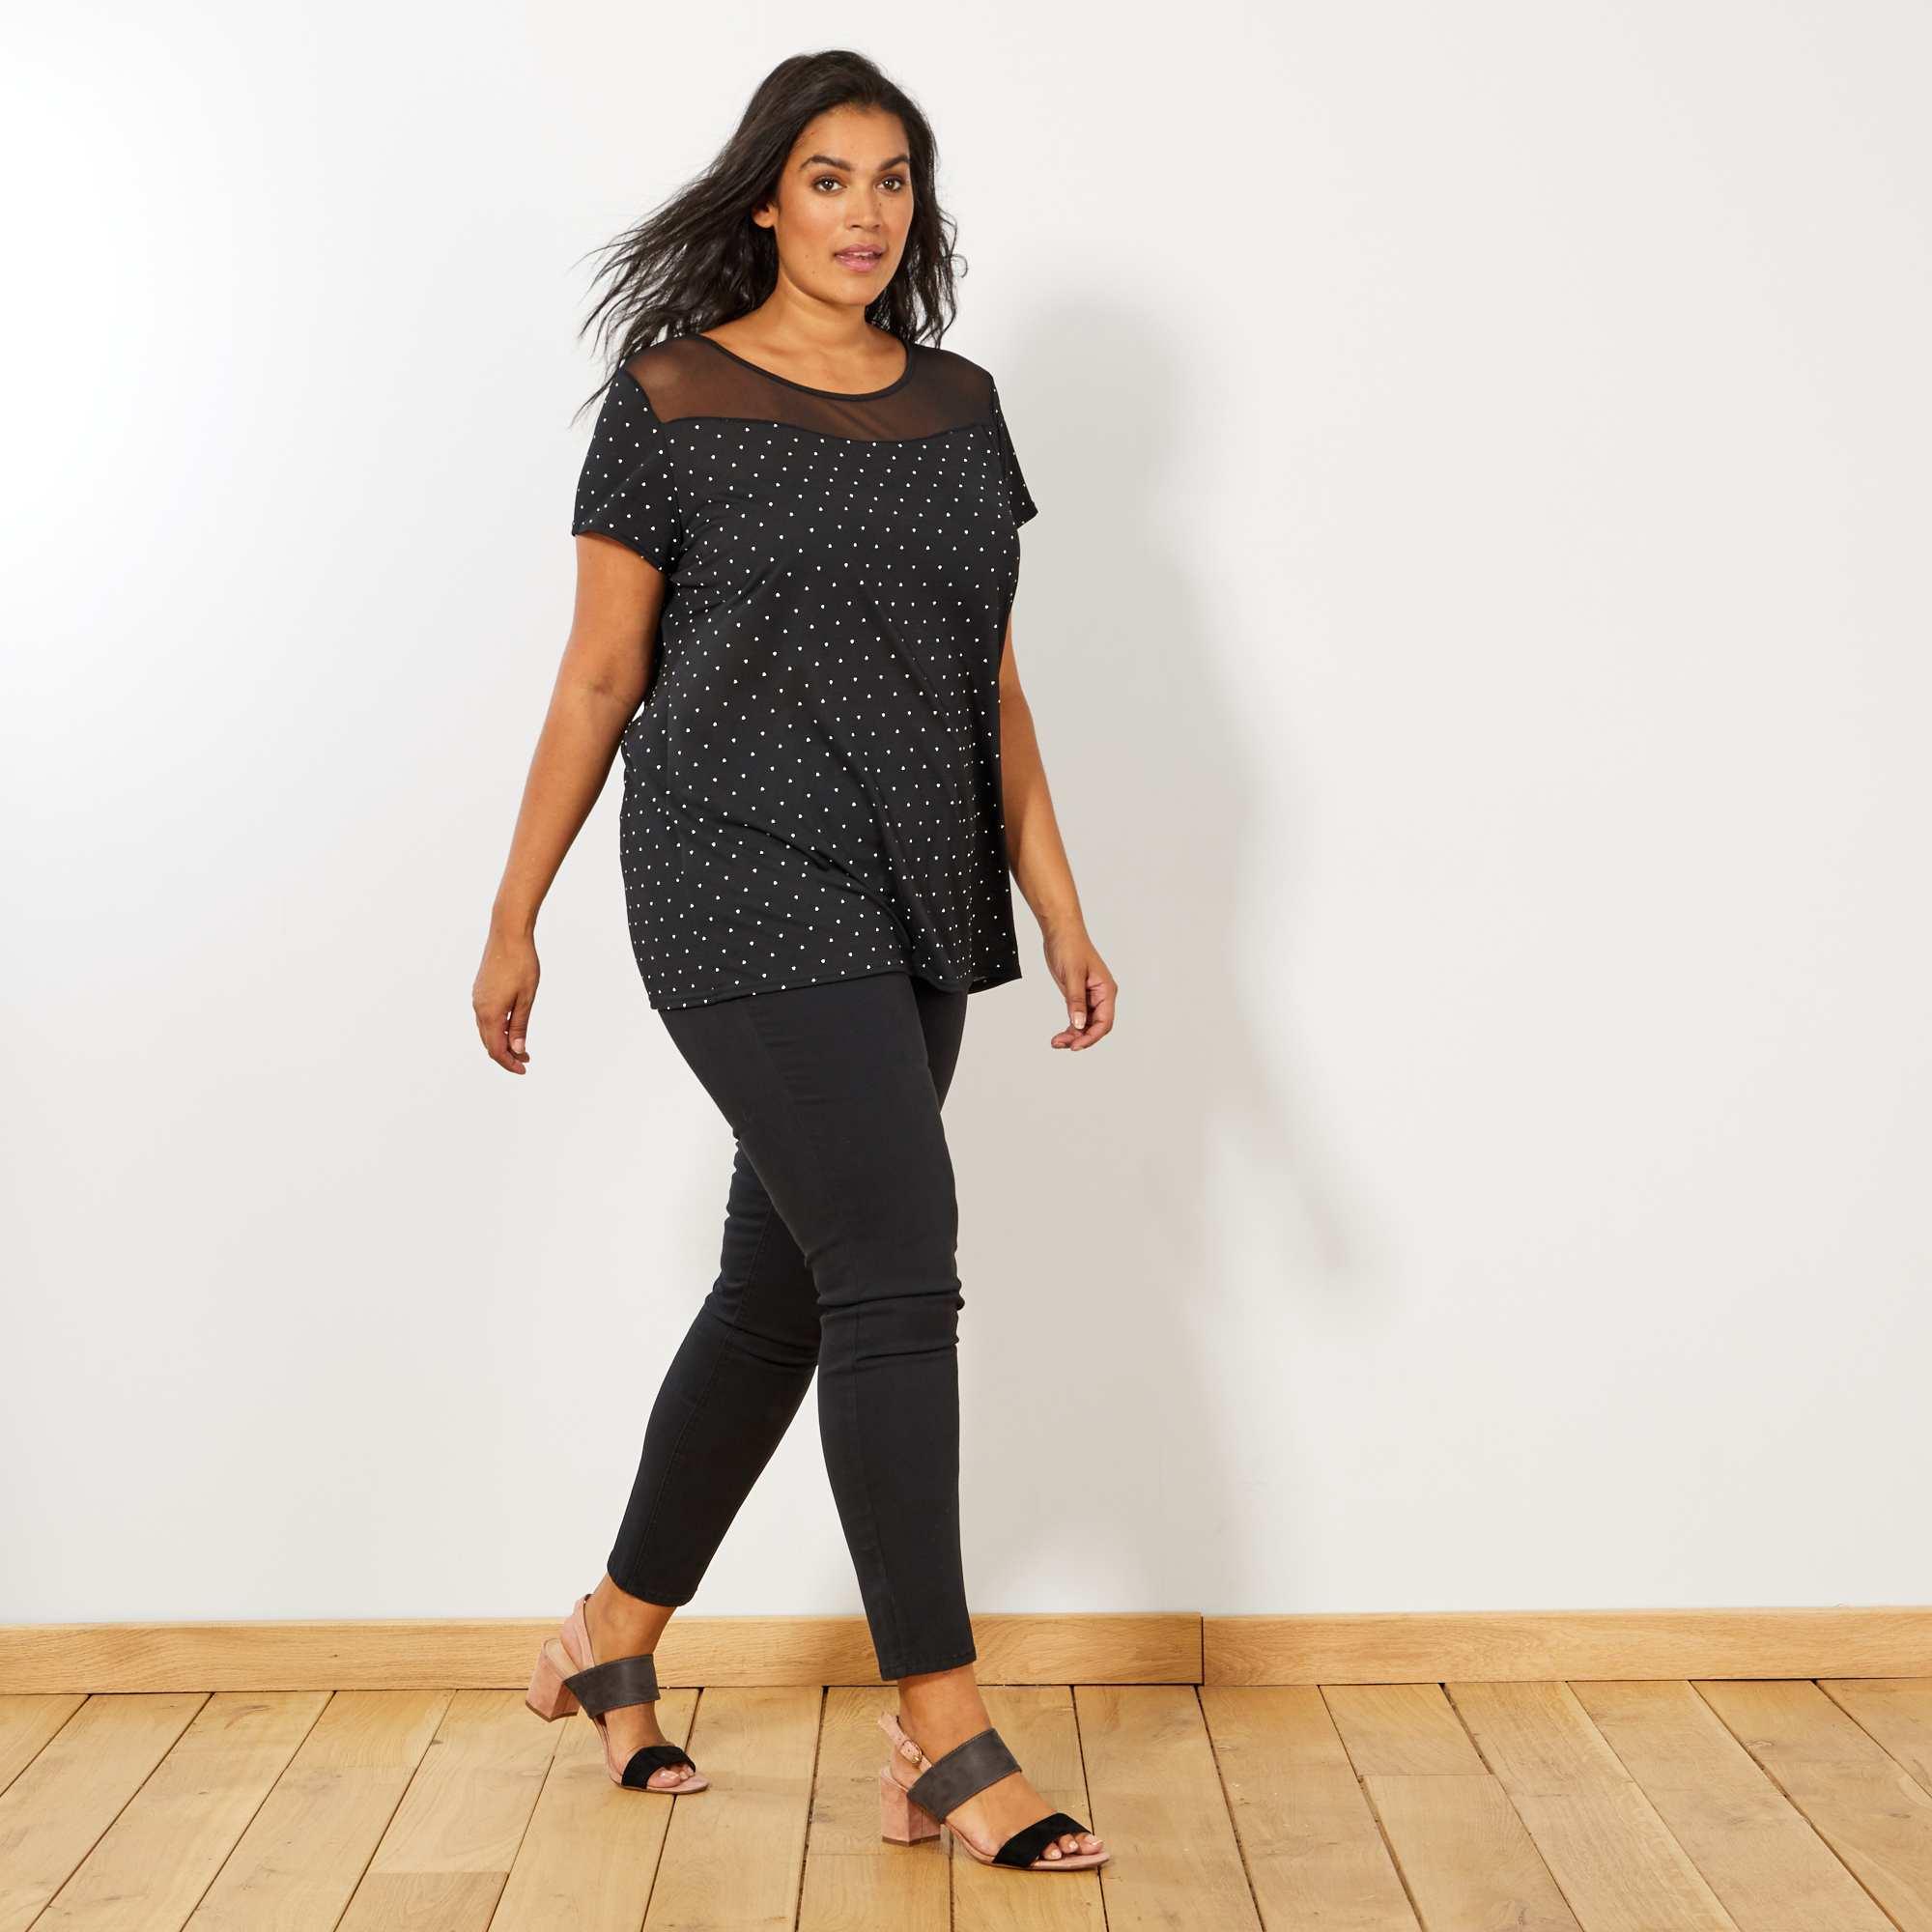 pantalon slim en gabardine stretch grande taille femme noir kiabi 18 00. Black Bedroom Furniture Sets. Home Design Ideas